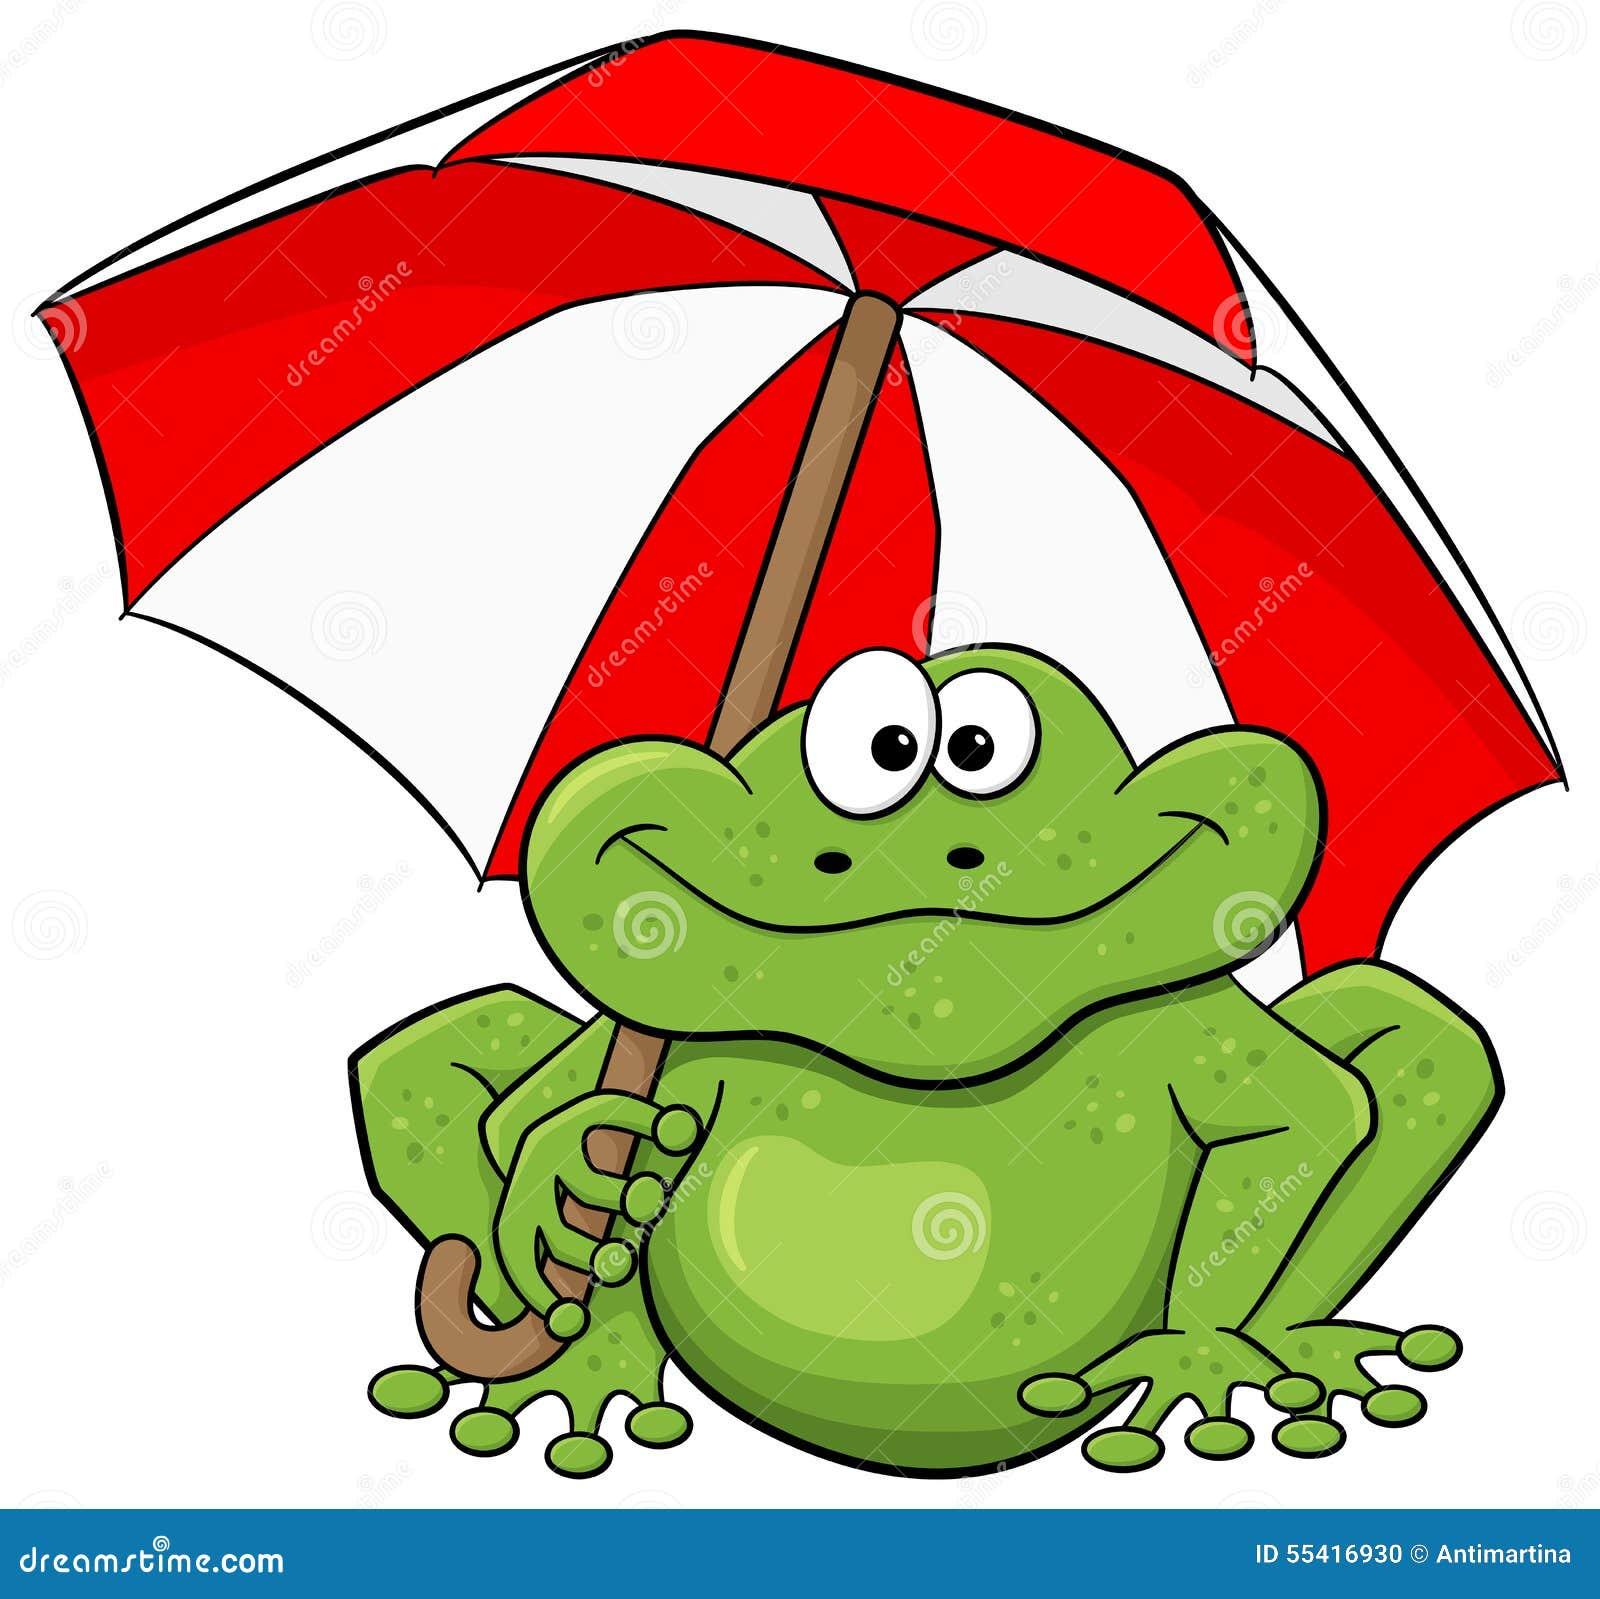 Cartoon frog with umbrella stock vector. Illustration of wildlife ...